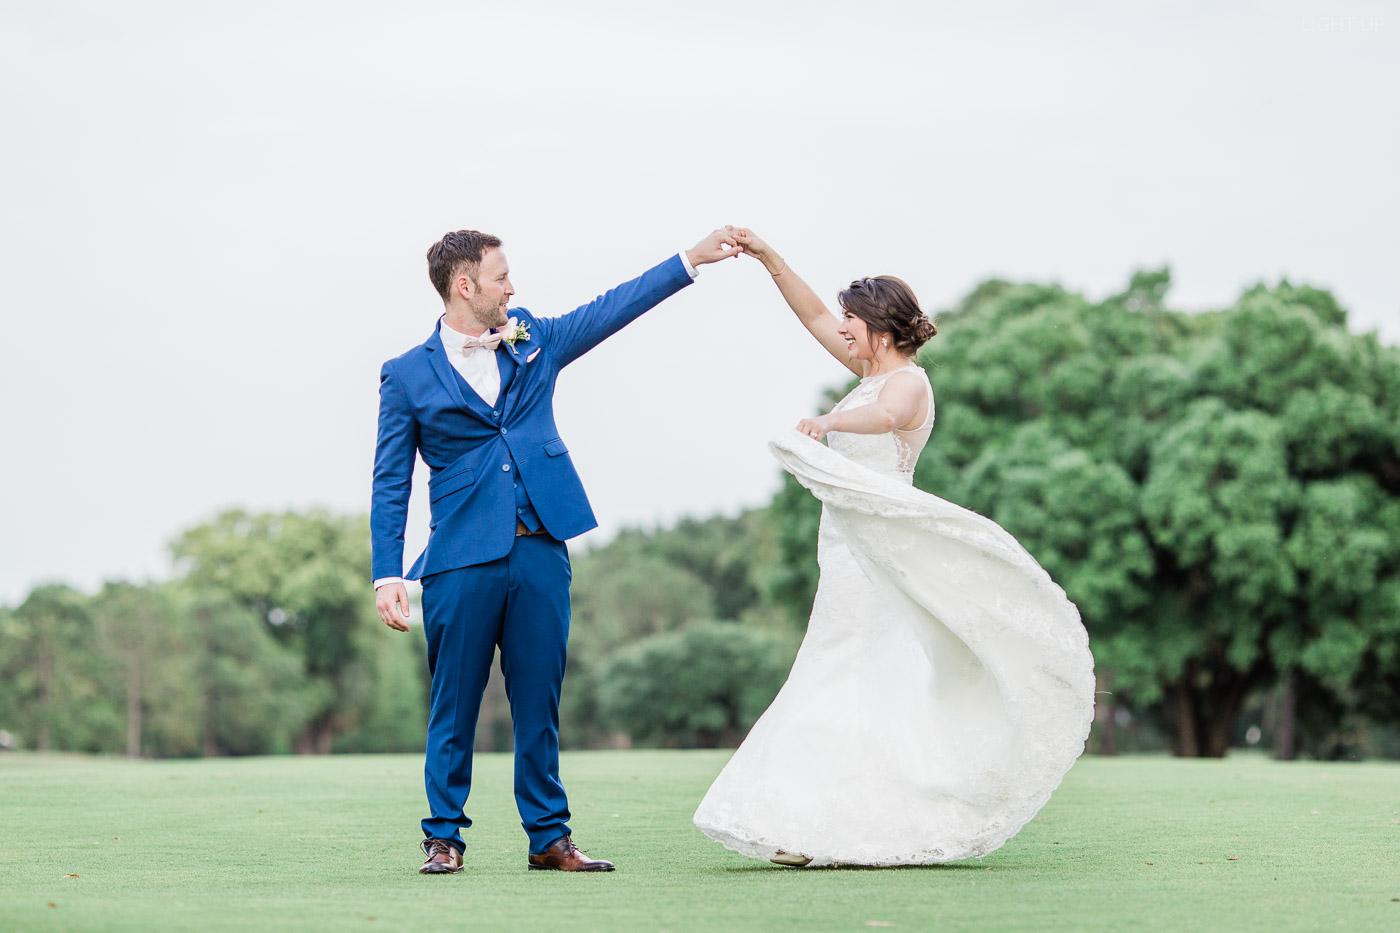 hstoric-dubsdread-wedding-orlando-29.jpg